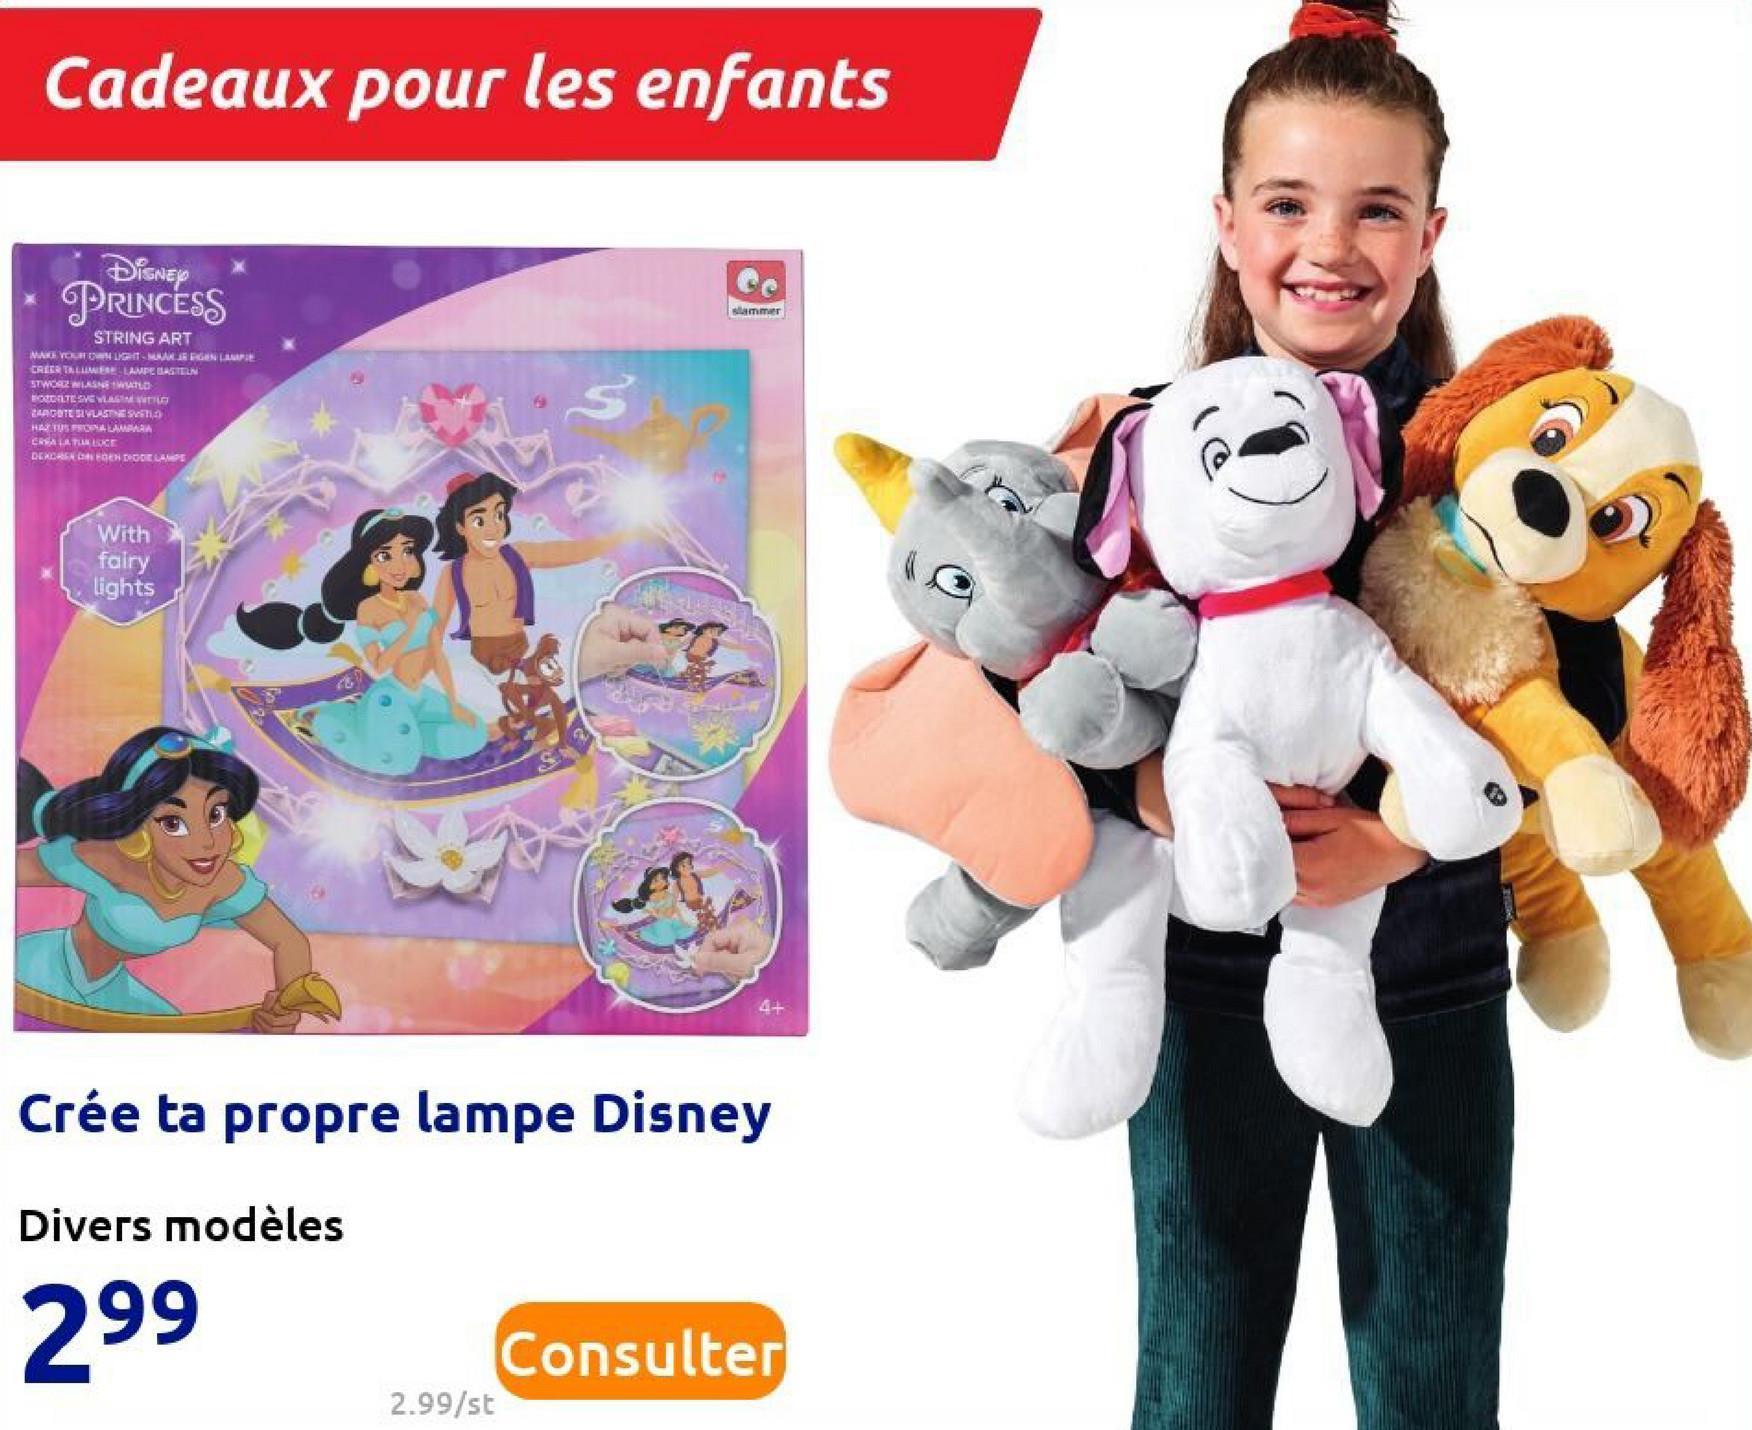 Cadeaux pour les enfants DISNEY PRINCESS stammer STRING ART MAYORISTMARGOLAMPIE CREER TRLUMIERE LAMPE BITEN STWO NIANS WALD EOSETE SVE MAGIA ZAGOTE VLASTNESIO HAZTUSSOPLAMAA ERSALATLAR LOCE DEARNEGO DODELAS With fairy lights 4+ Crée ta propre lampe Disney Divers modèles 299 Consulter 2.99/st